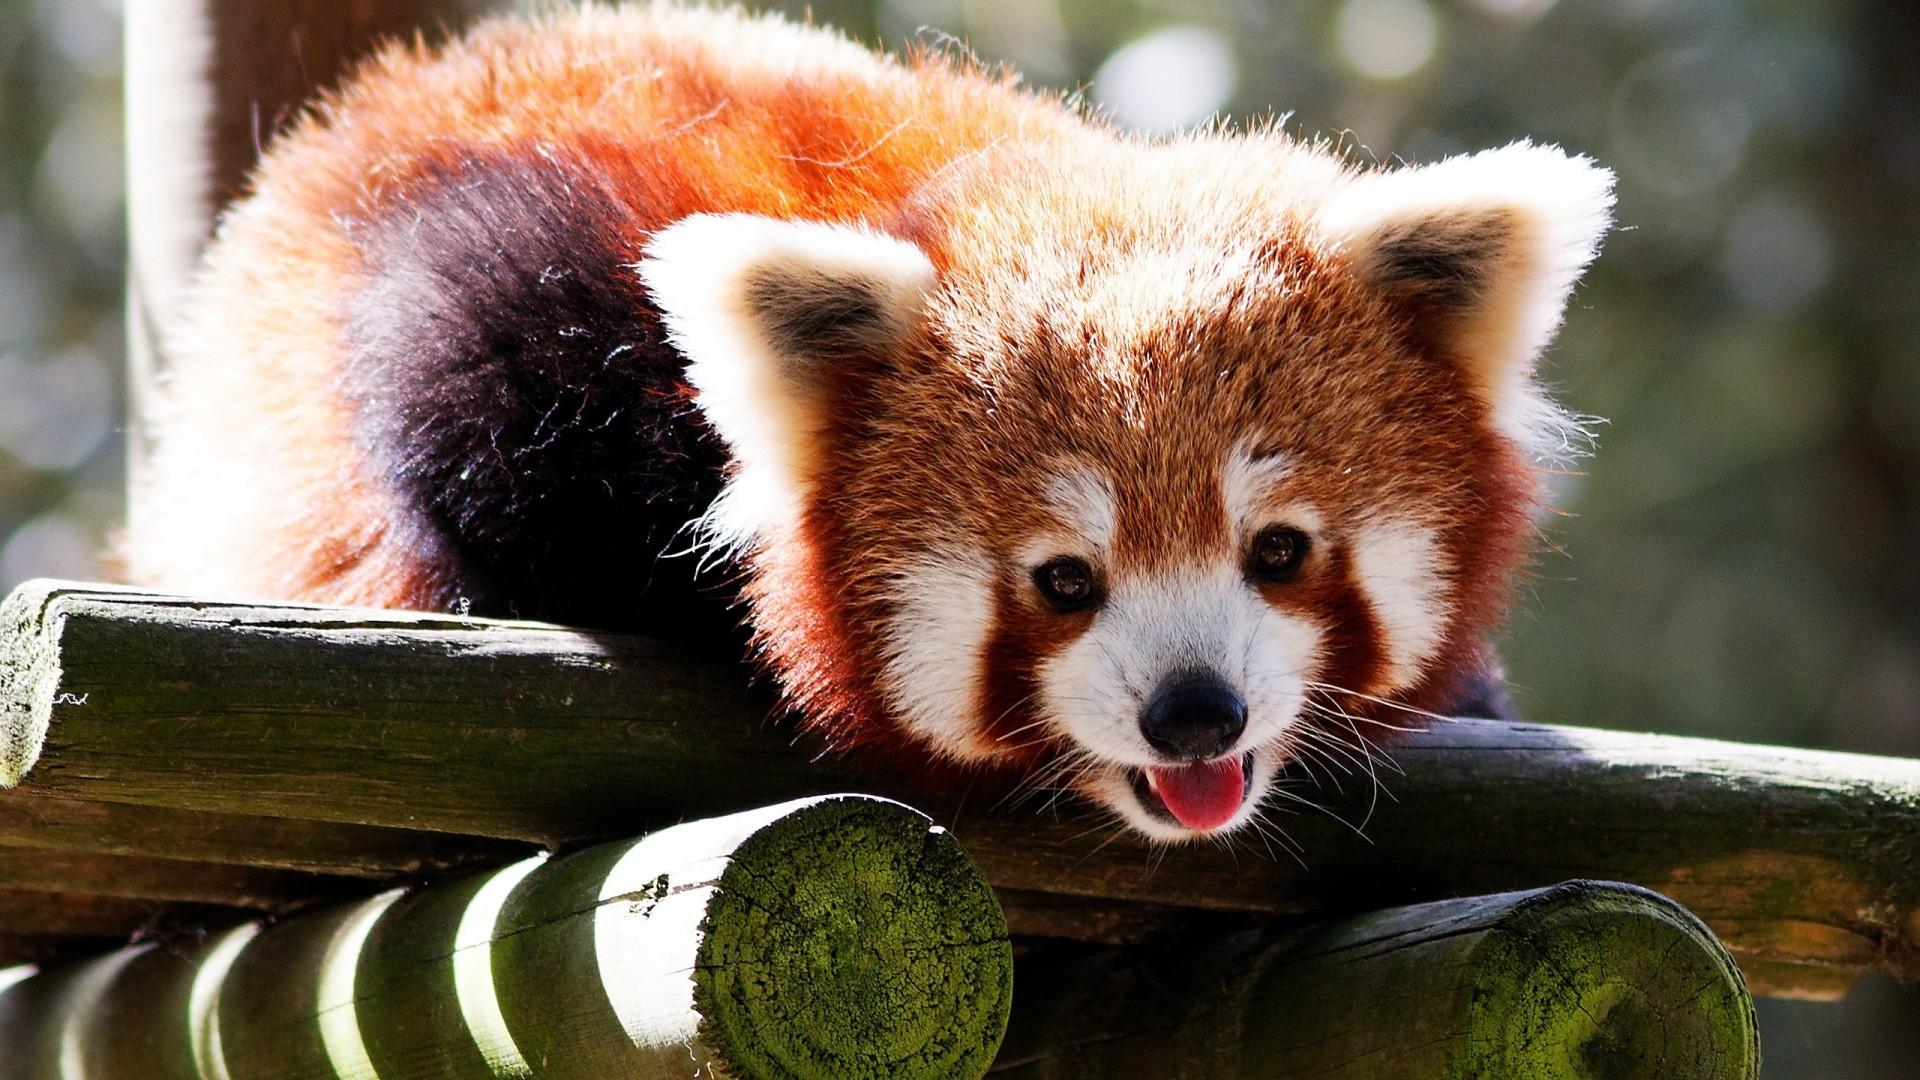 28 HD Red Panda Desktop Wallpapers For Free Download